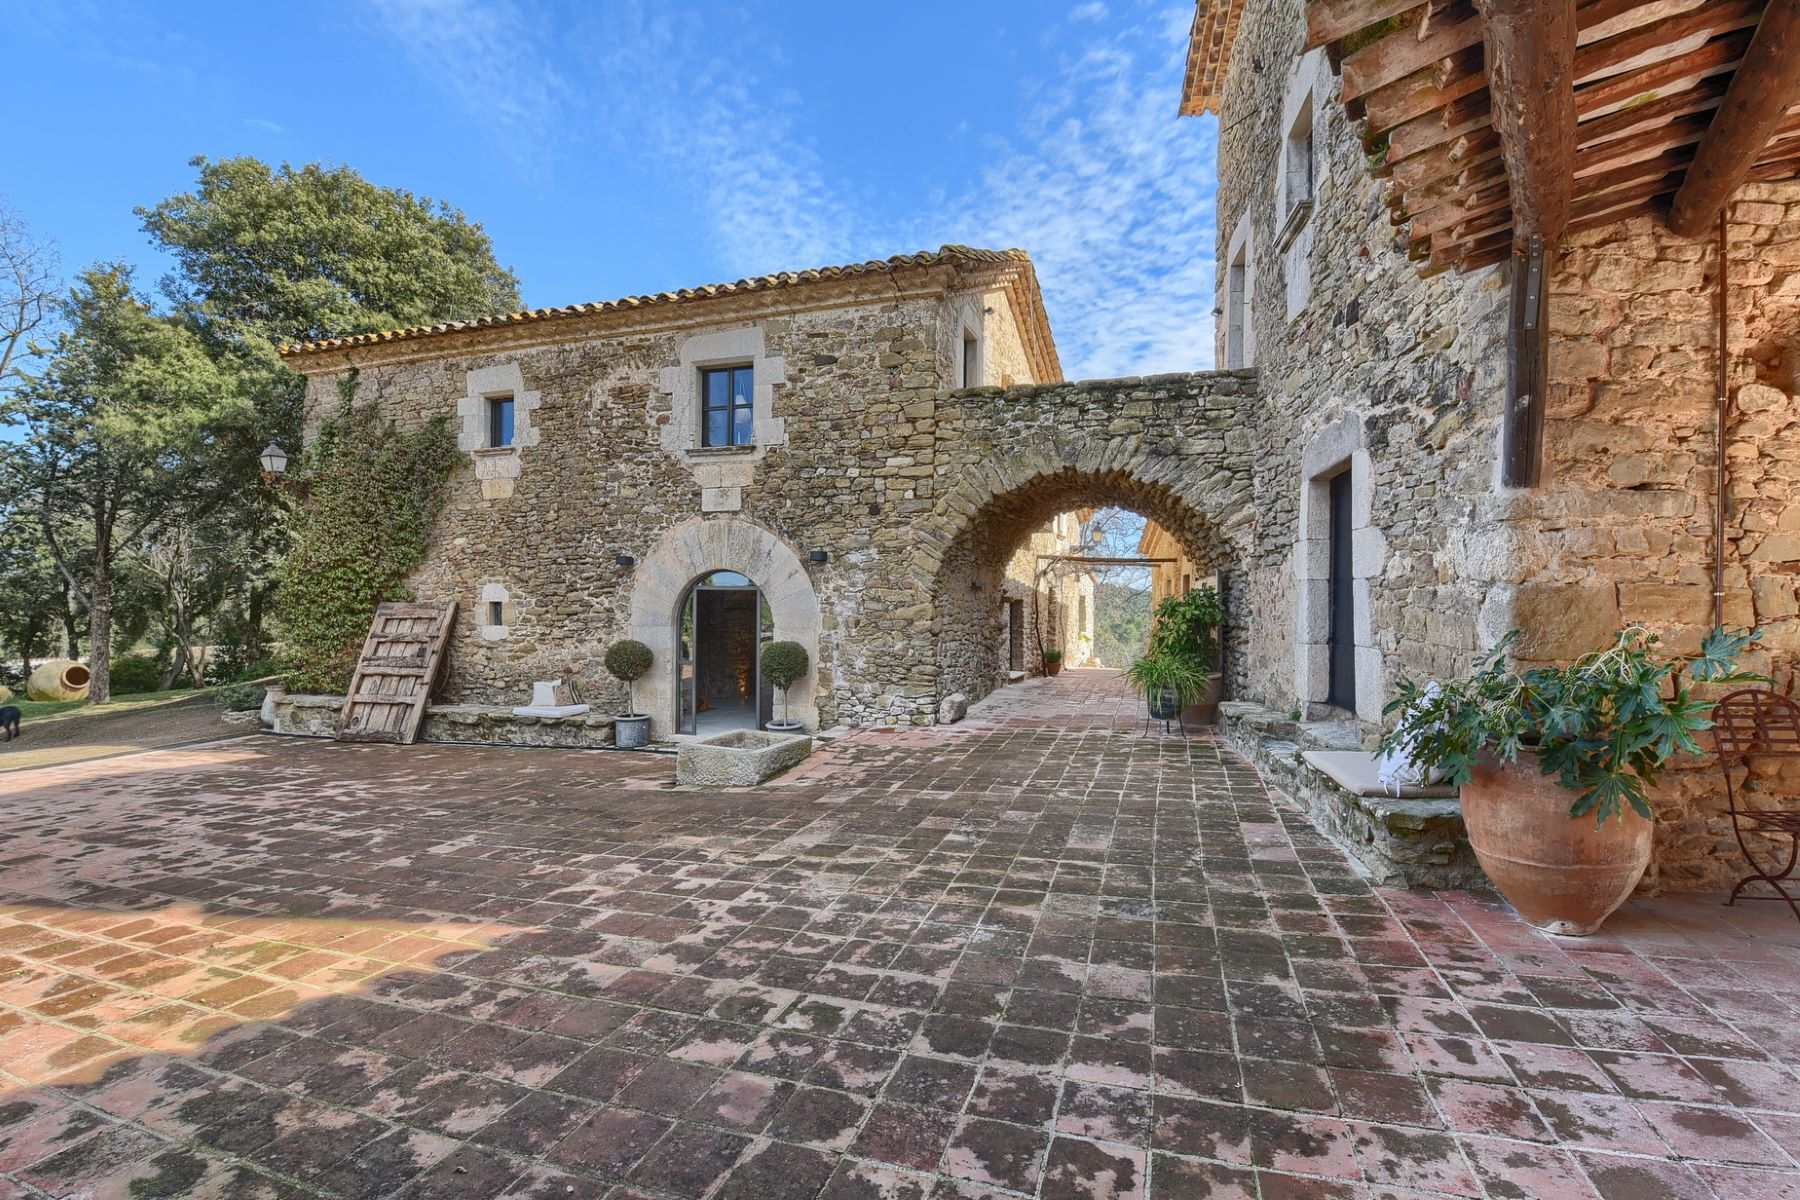 Частный односемейный дом для того Продажа на Beautiful farmhouse 20 minutes from Girona, surrounded by nature and tranqui ... Pals, Costa Brava, 17256 Испания